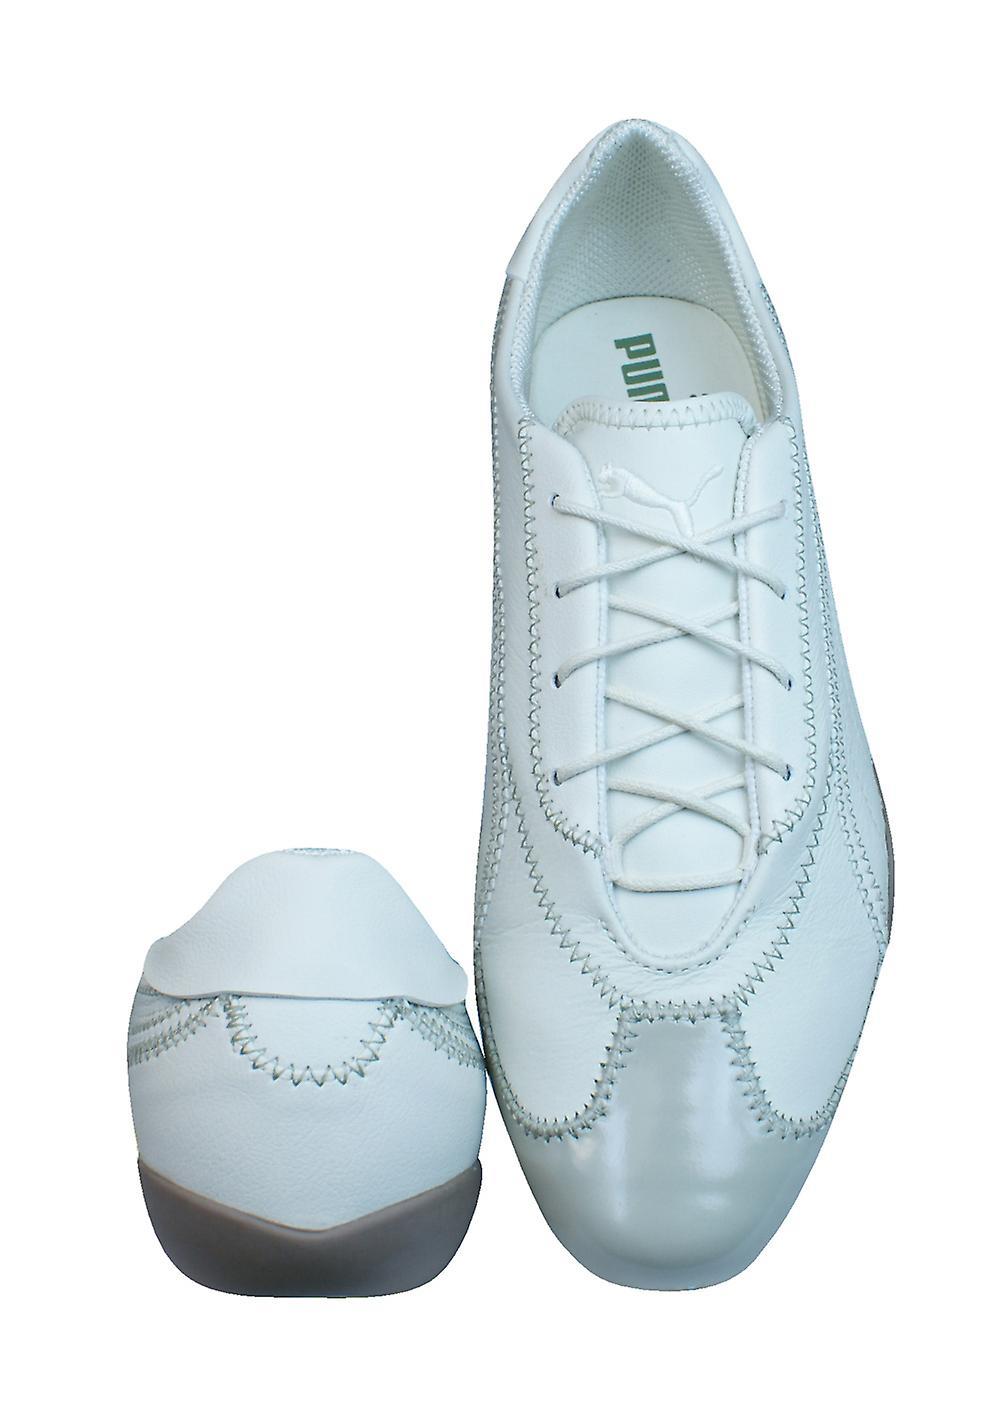 Puma Dapper Dan L Womens Trainers Trainers Trainers / Shoes - White 5a0b78